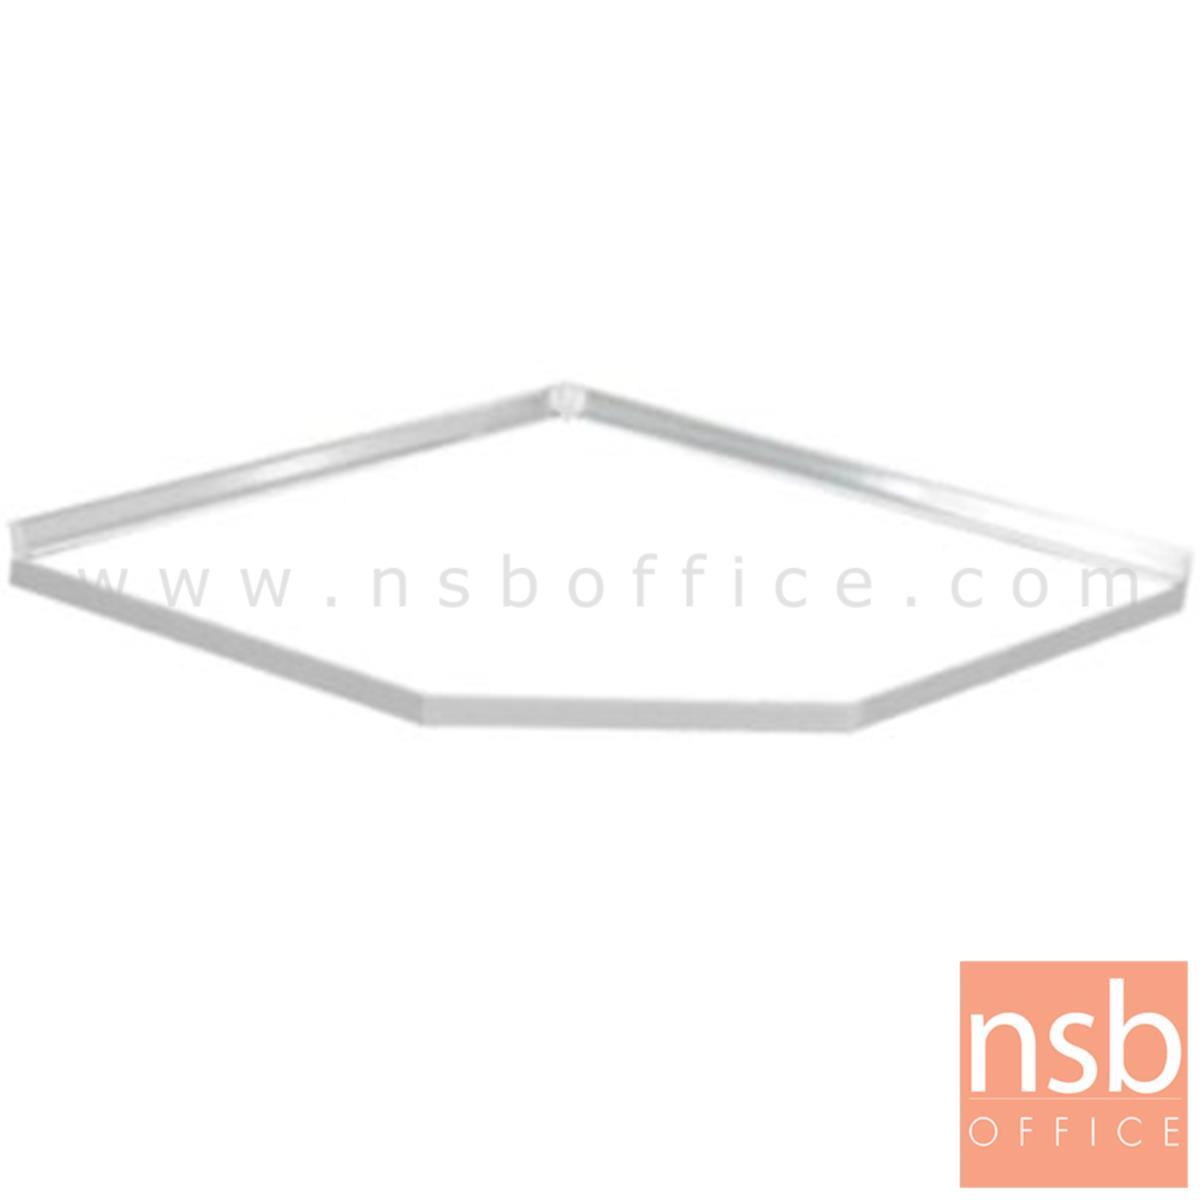 K01A029:แผ่น TOP ปิดด้านบนของตู้ครัวเข้ามุม 90W*90D*3.4H cm.